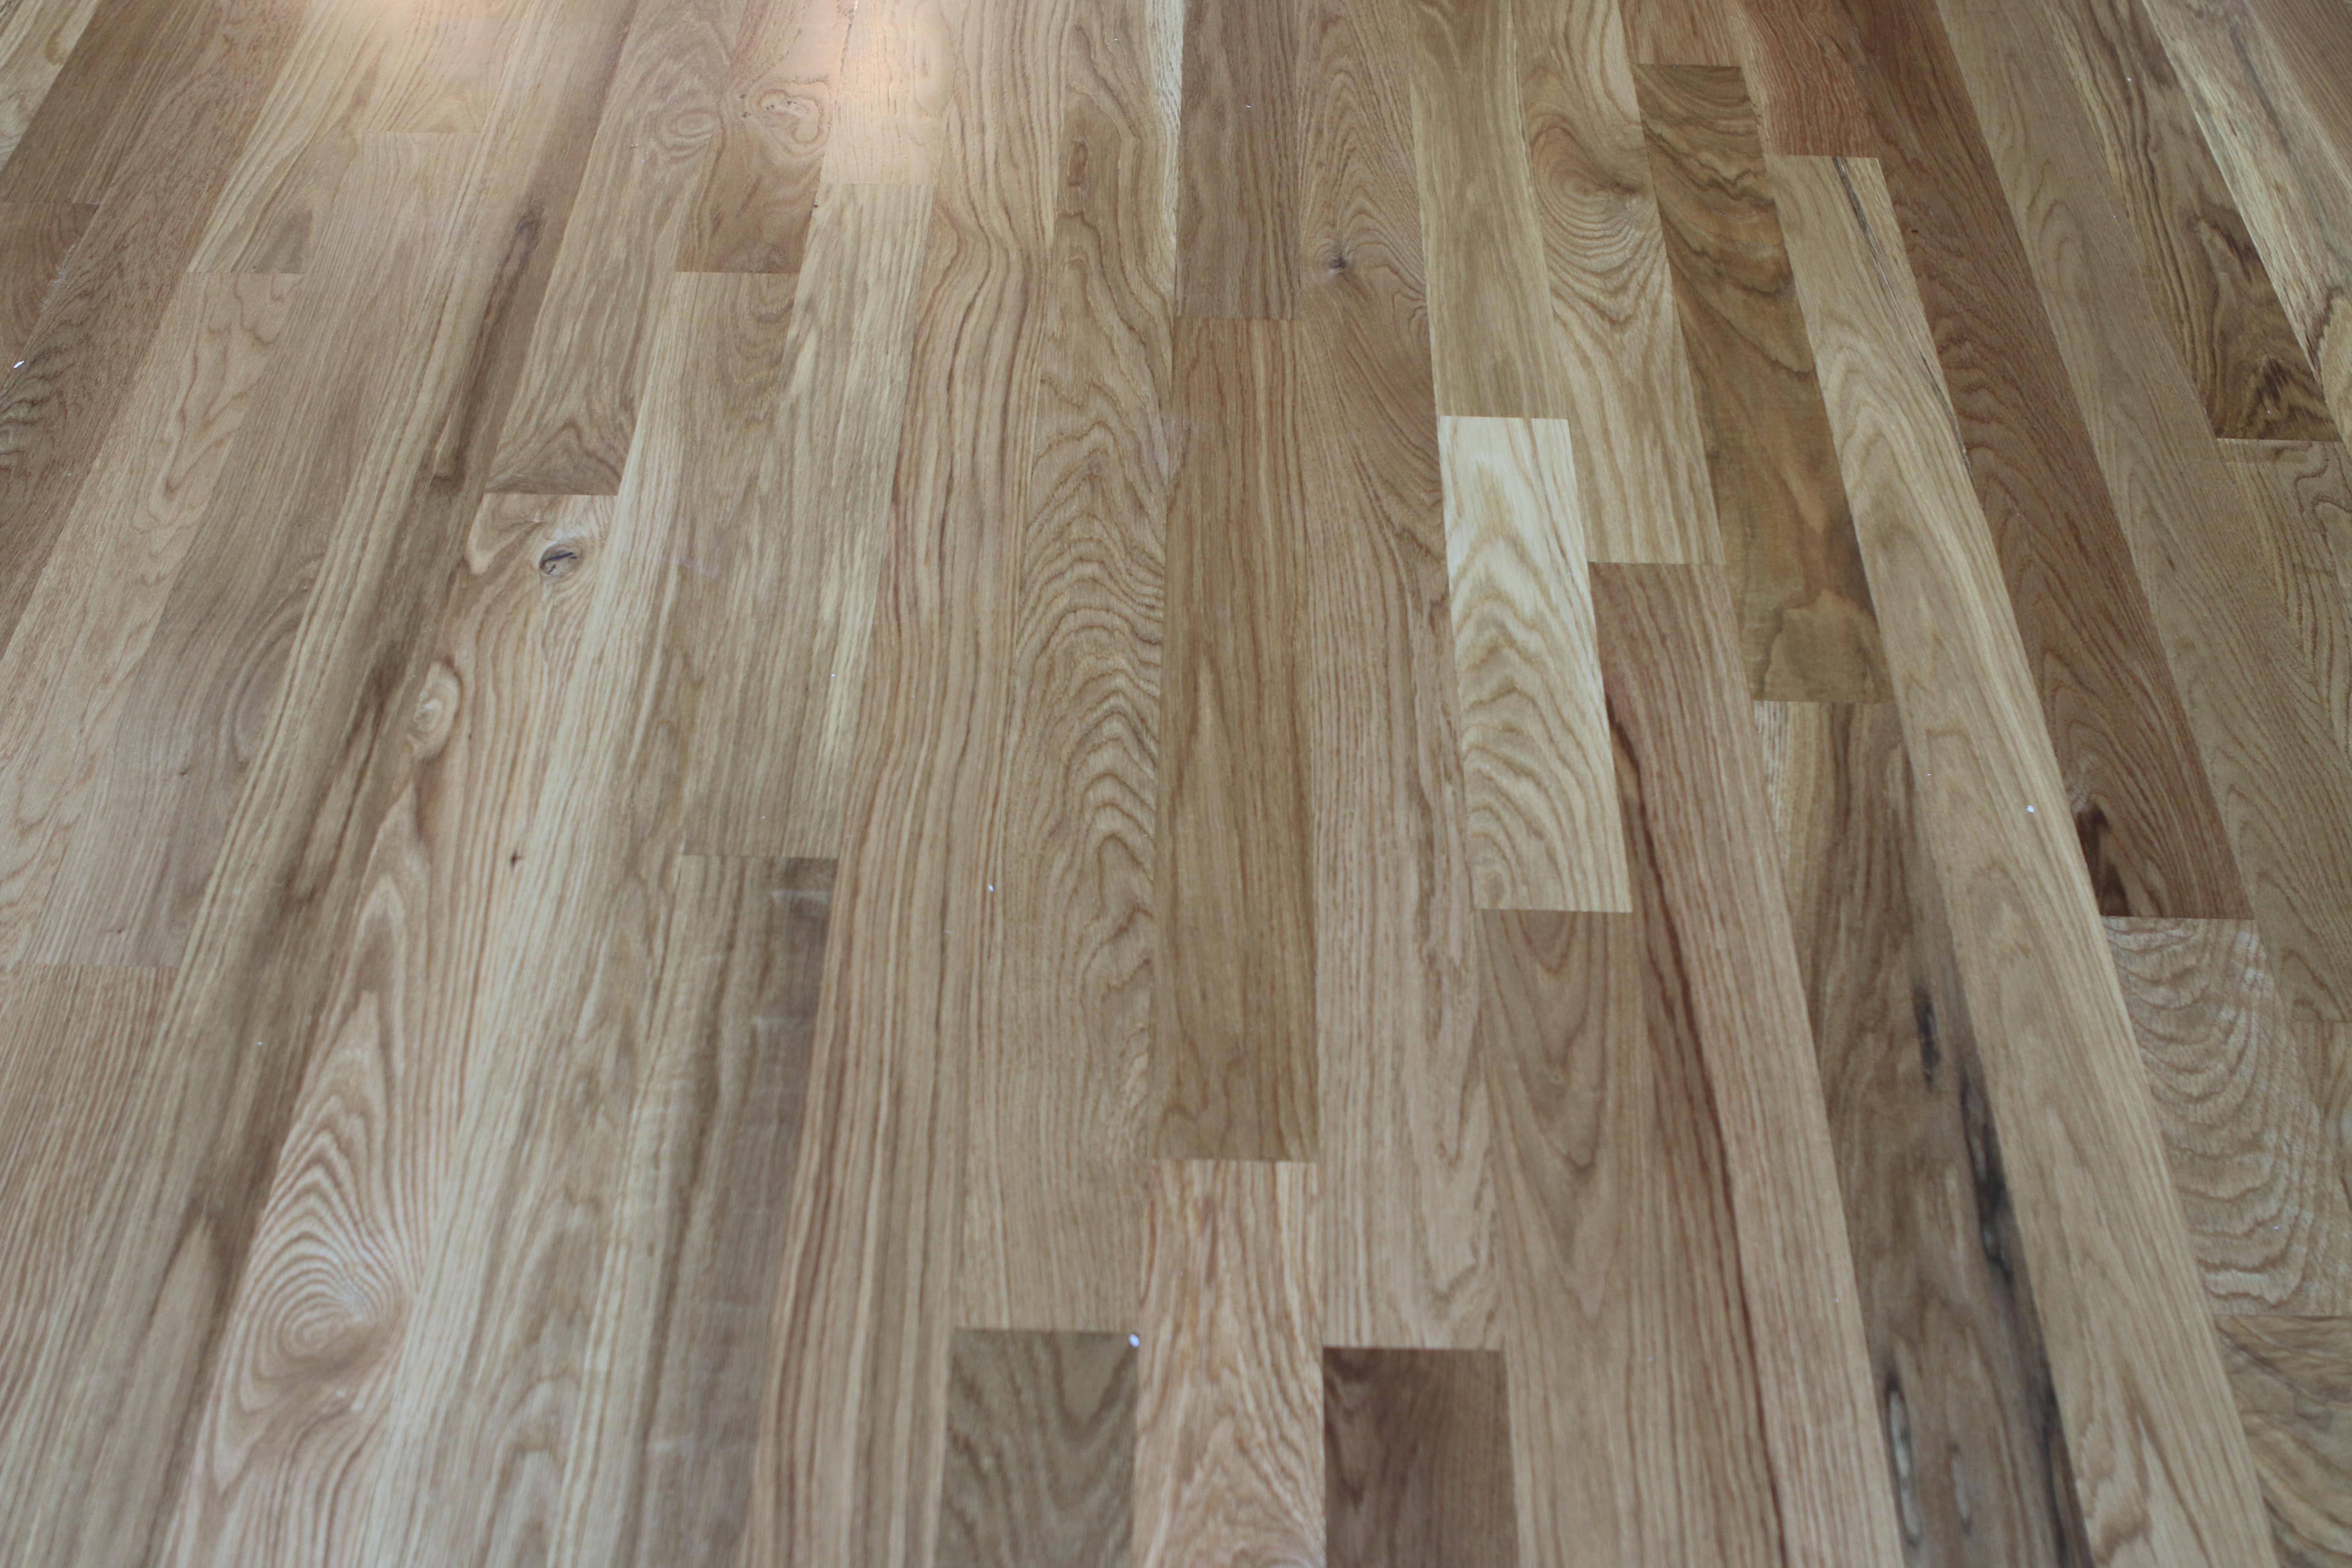 Practical Renovations Wood floors image 3